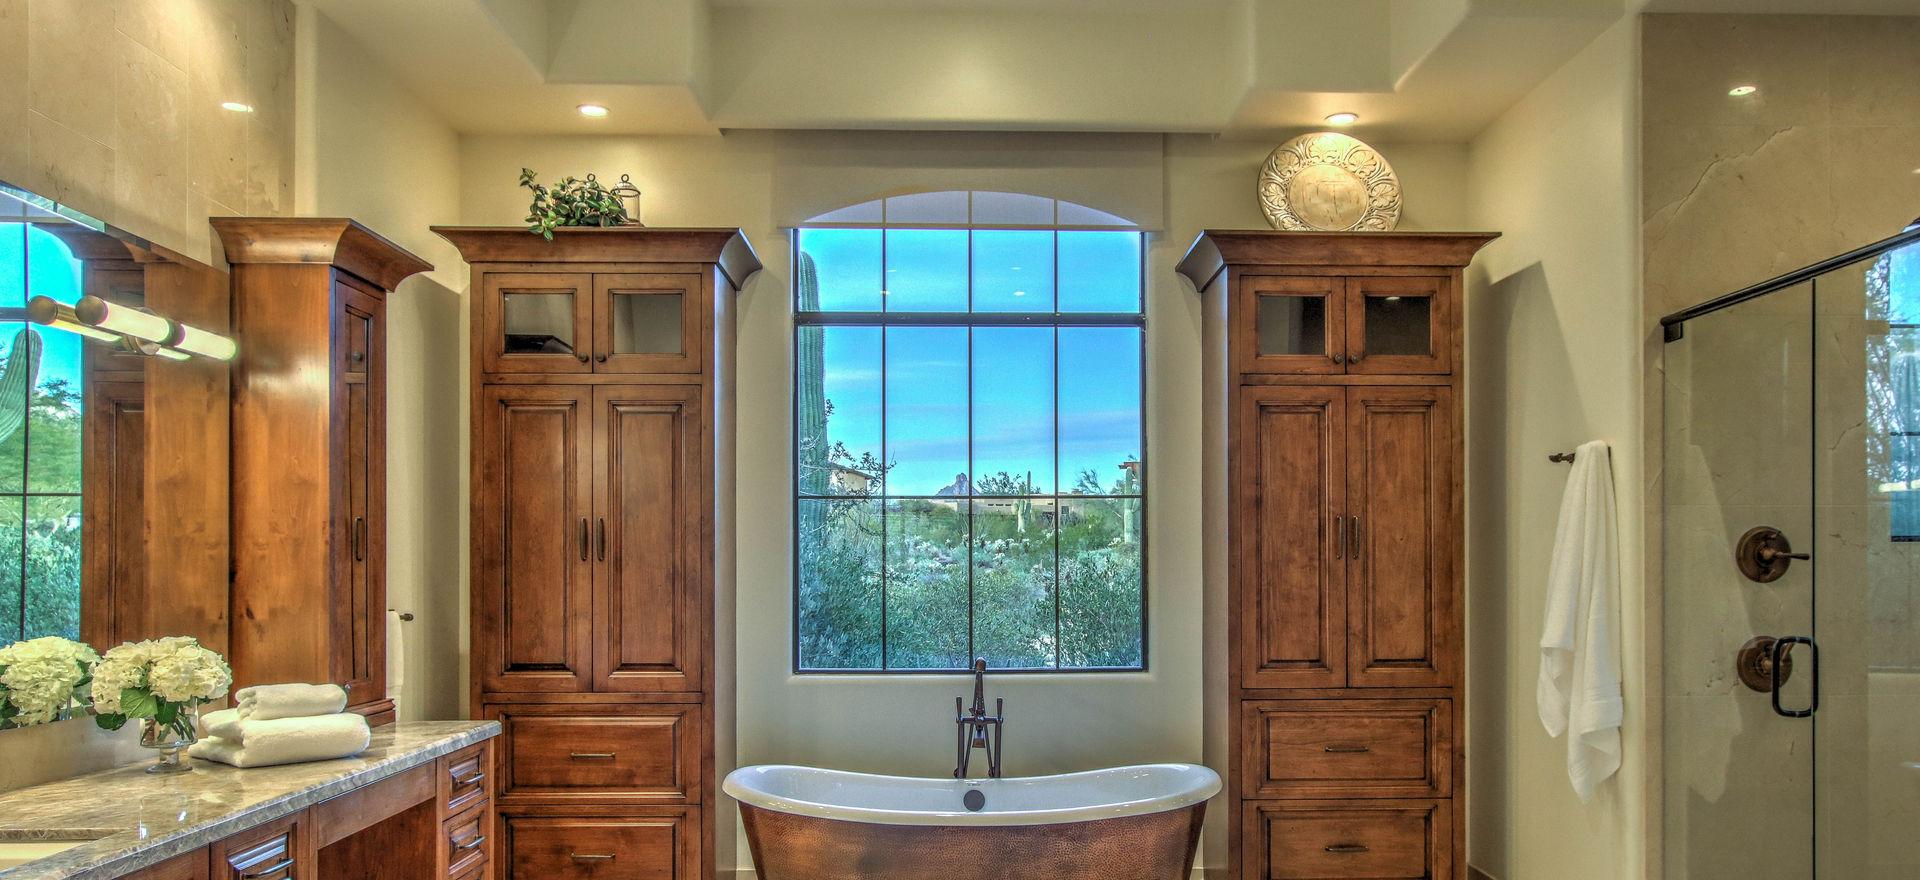 WINE ROOM, MASTER BATH, GREAT ROOM & MORE!